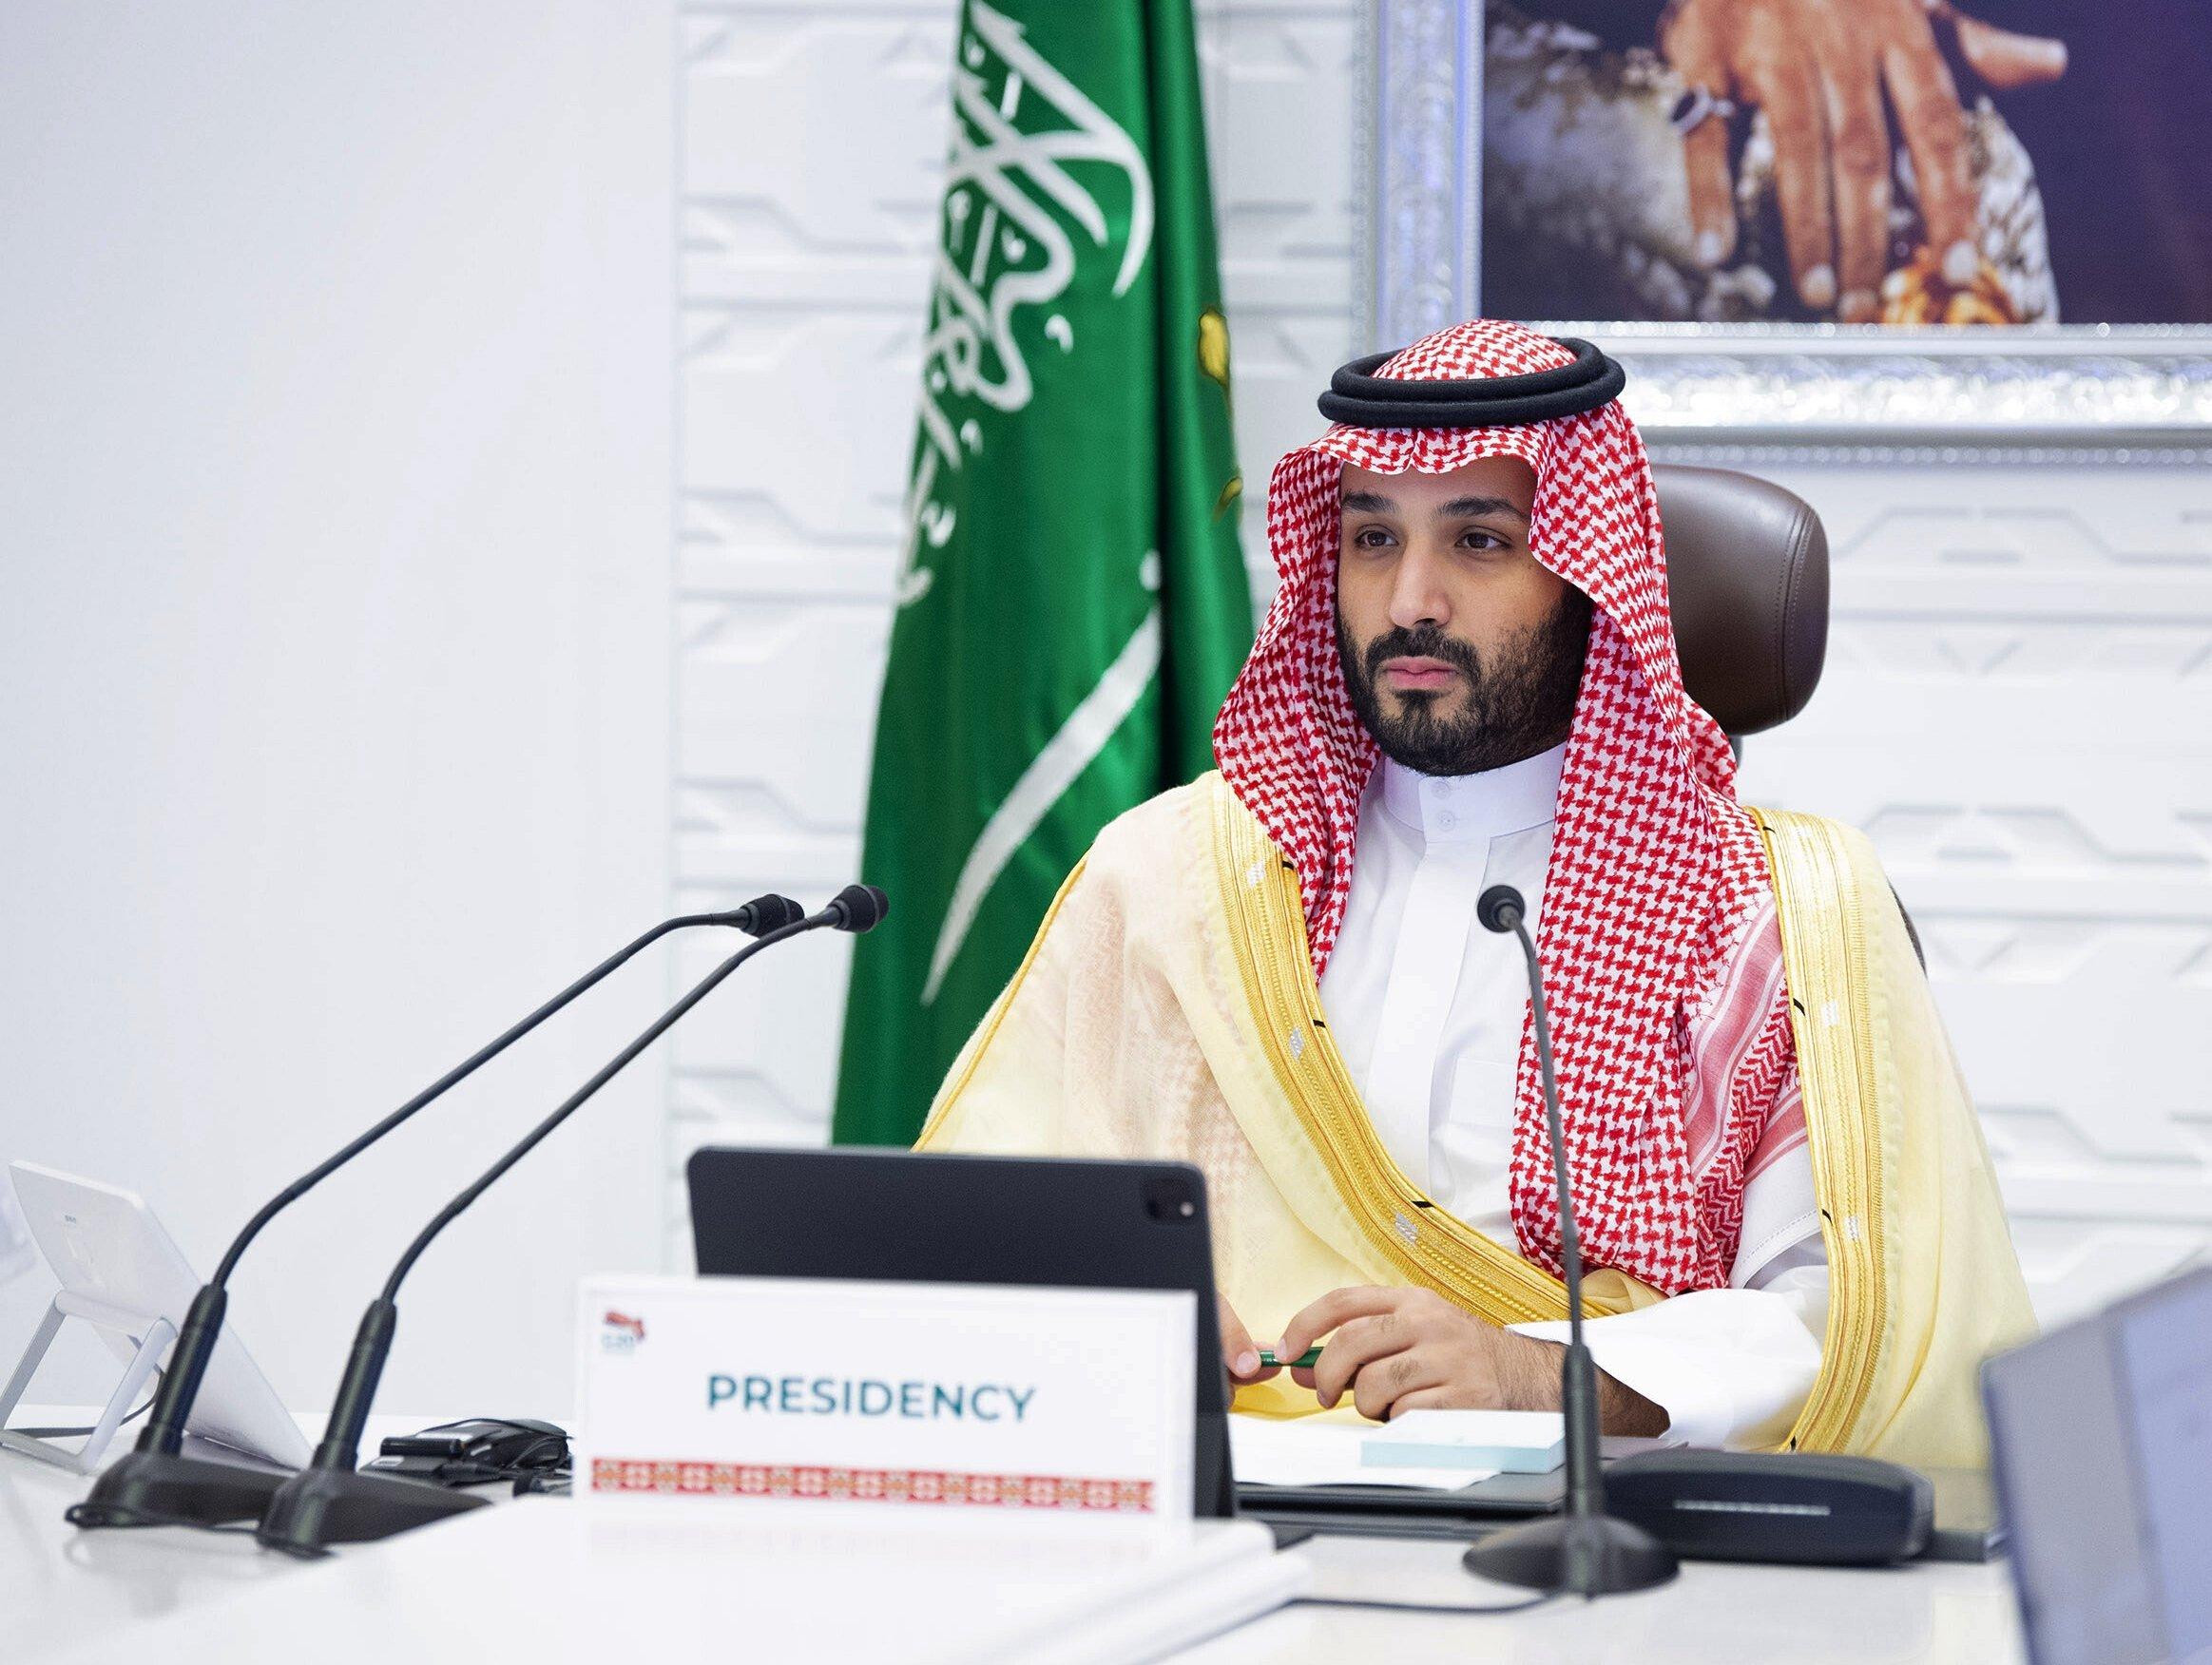 Saudi Arabia's Crown Prince Mohammed bin Salman (MBS) attends a virtual G-20 summit held via videoconference, Riyadh, Saudi Arabia, Nov. 22, 2020. (AP Photo)